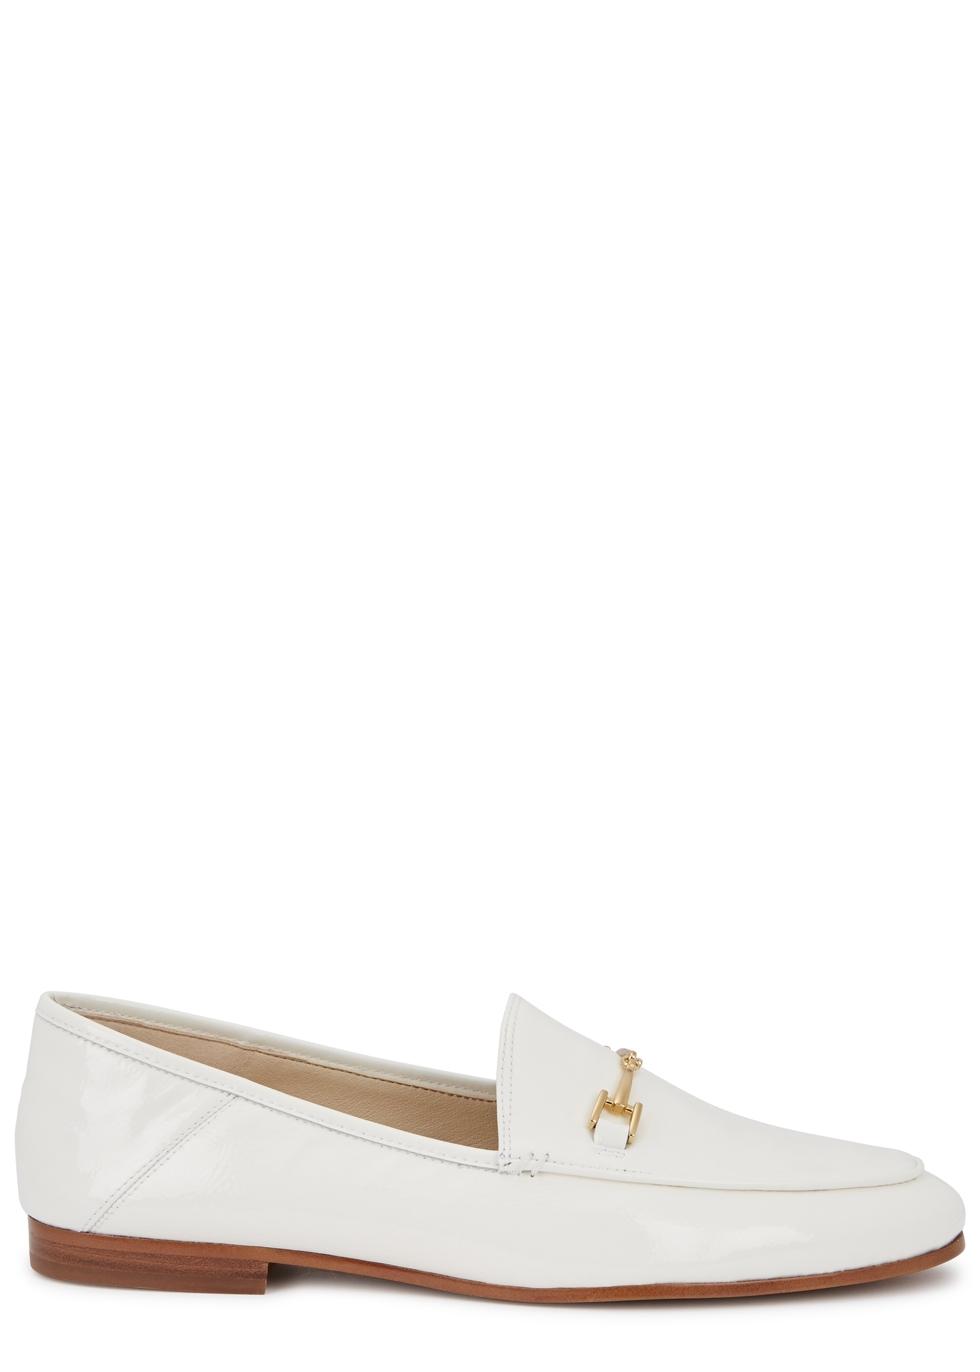 Designer Shoes Heels Trainers Slippers Harvey Nichols D Island Moccasine Slip On Lacoste Suede Blue